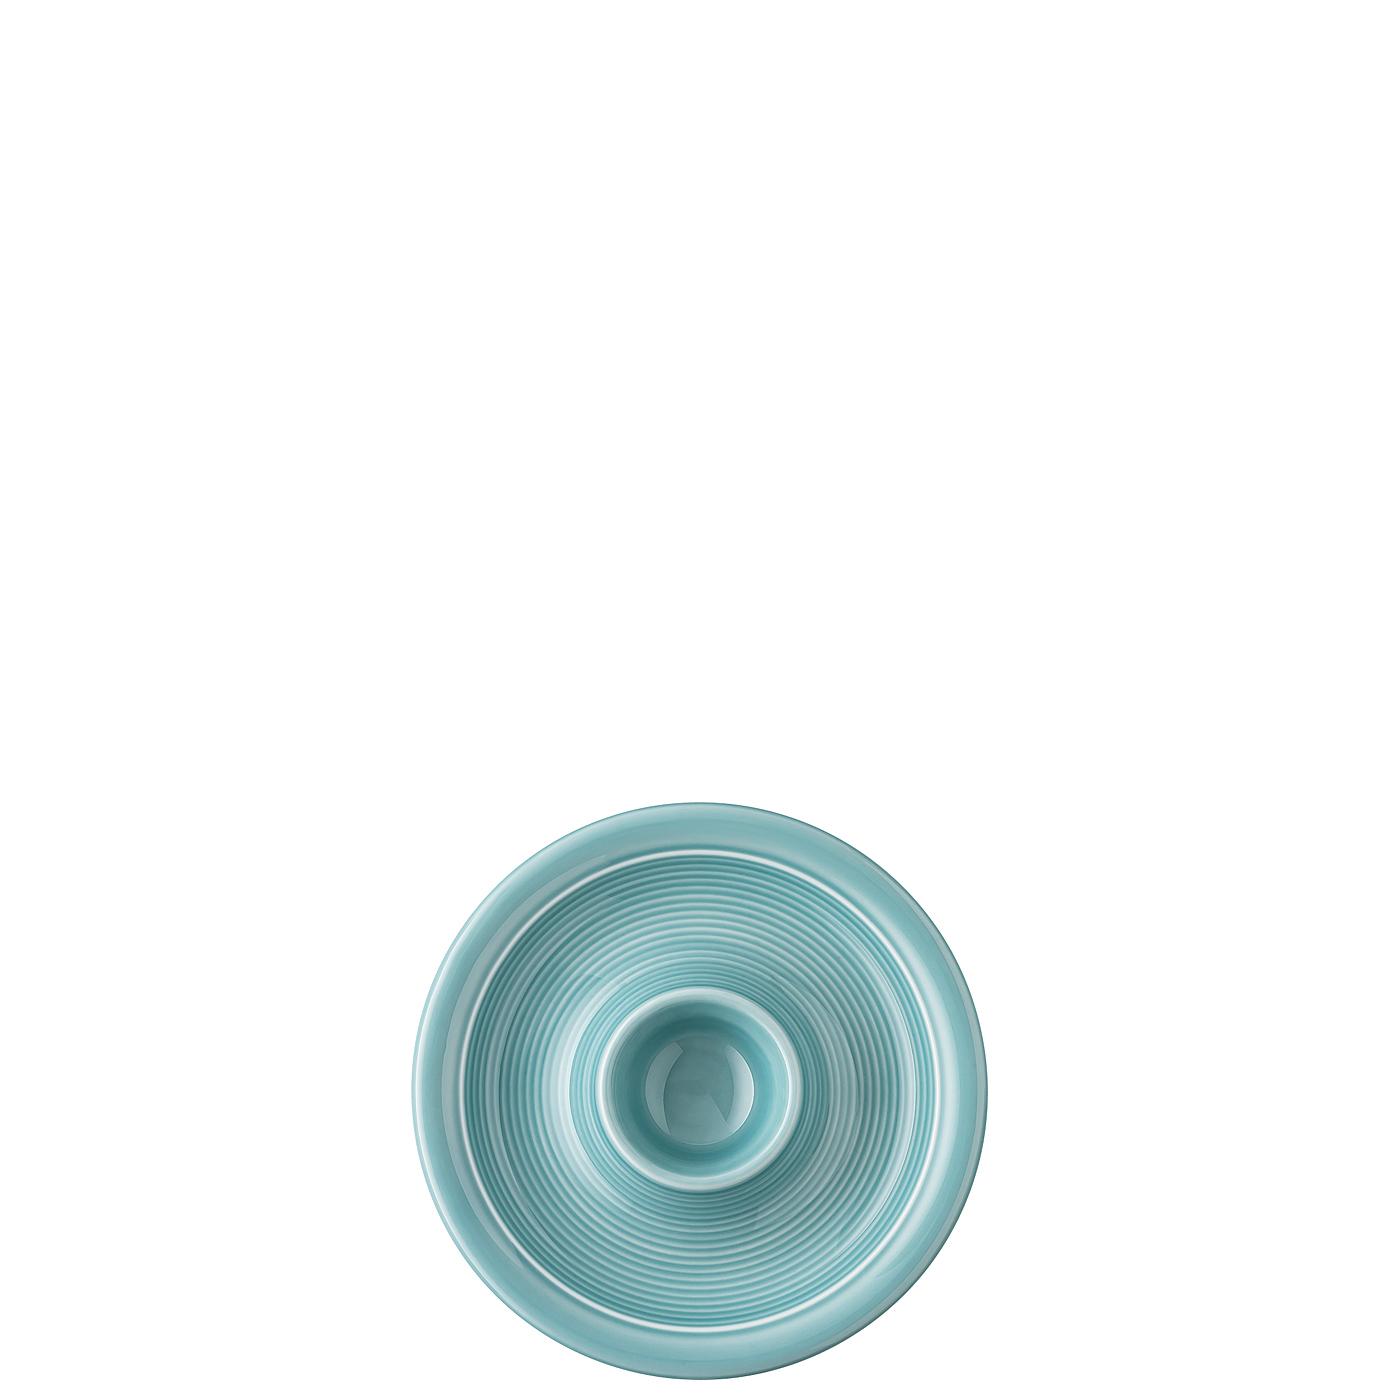 Eierbecher mit Ablage Trend Colour Ice Blue Thomas Porzellan